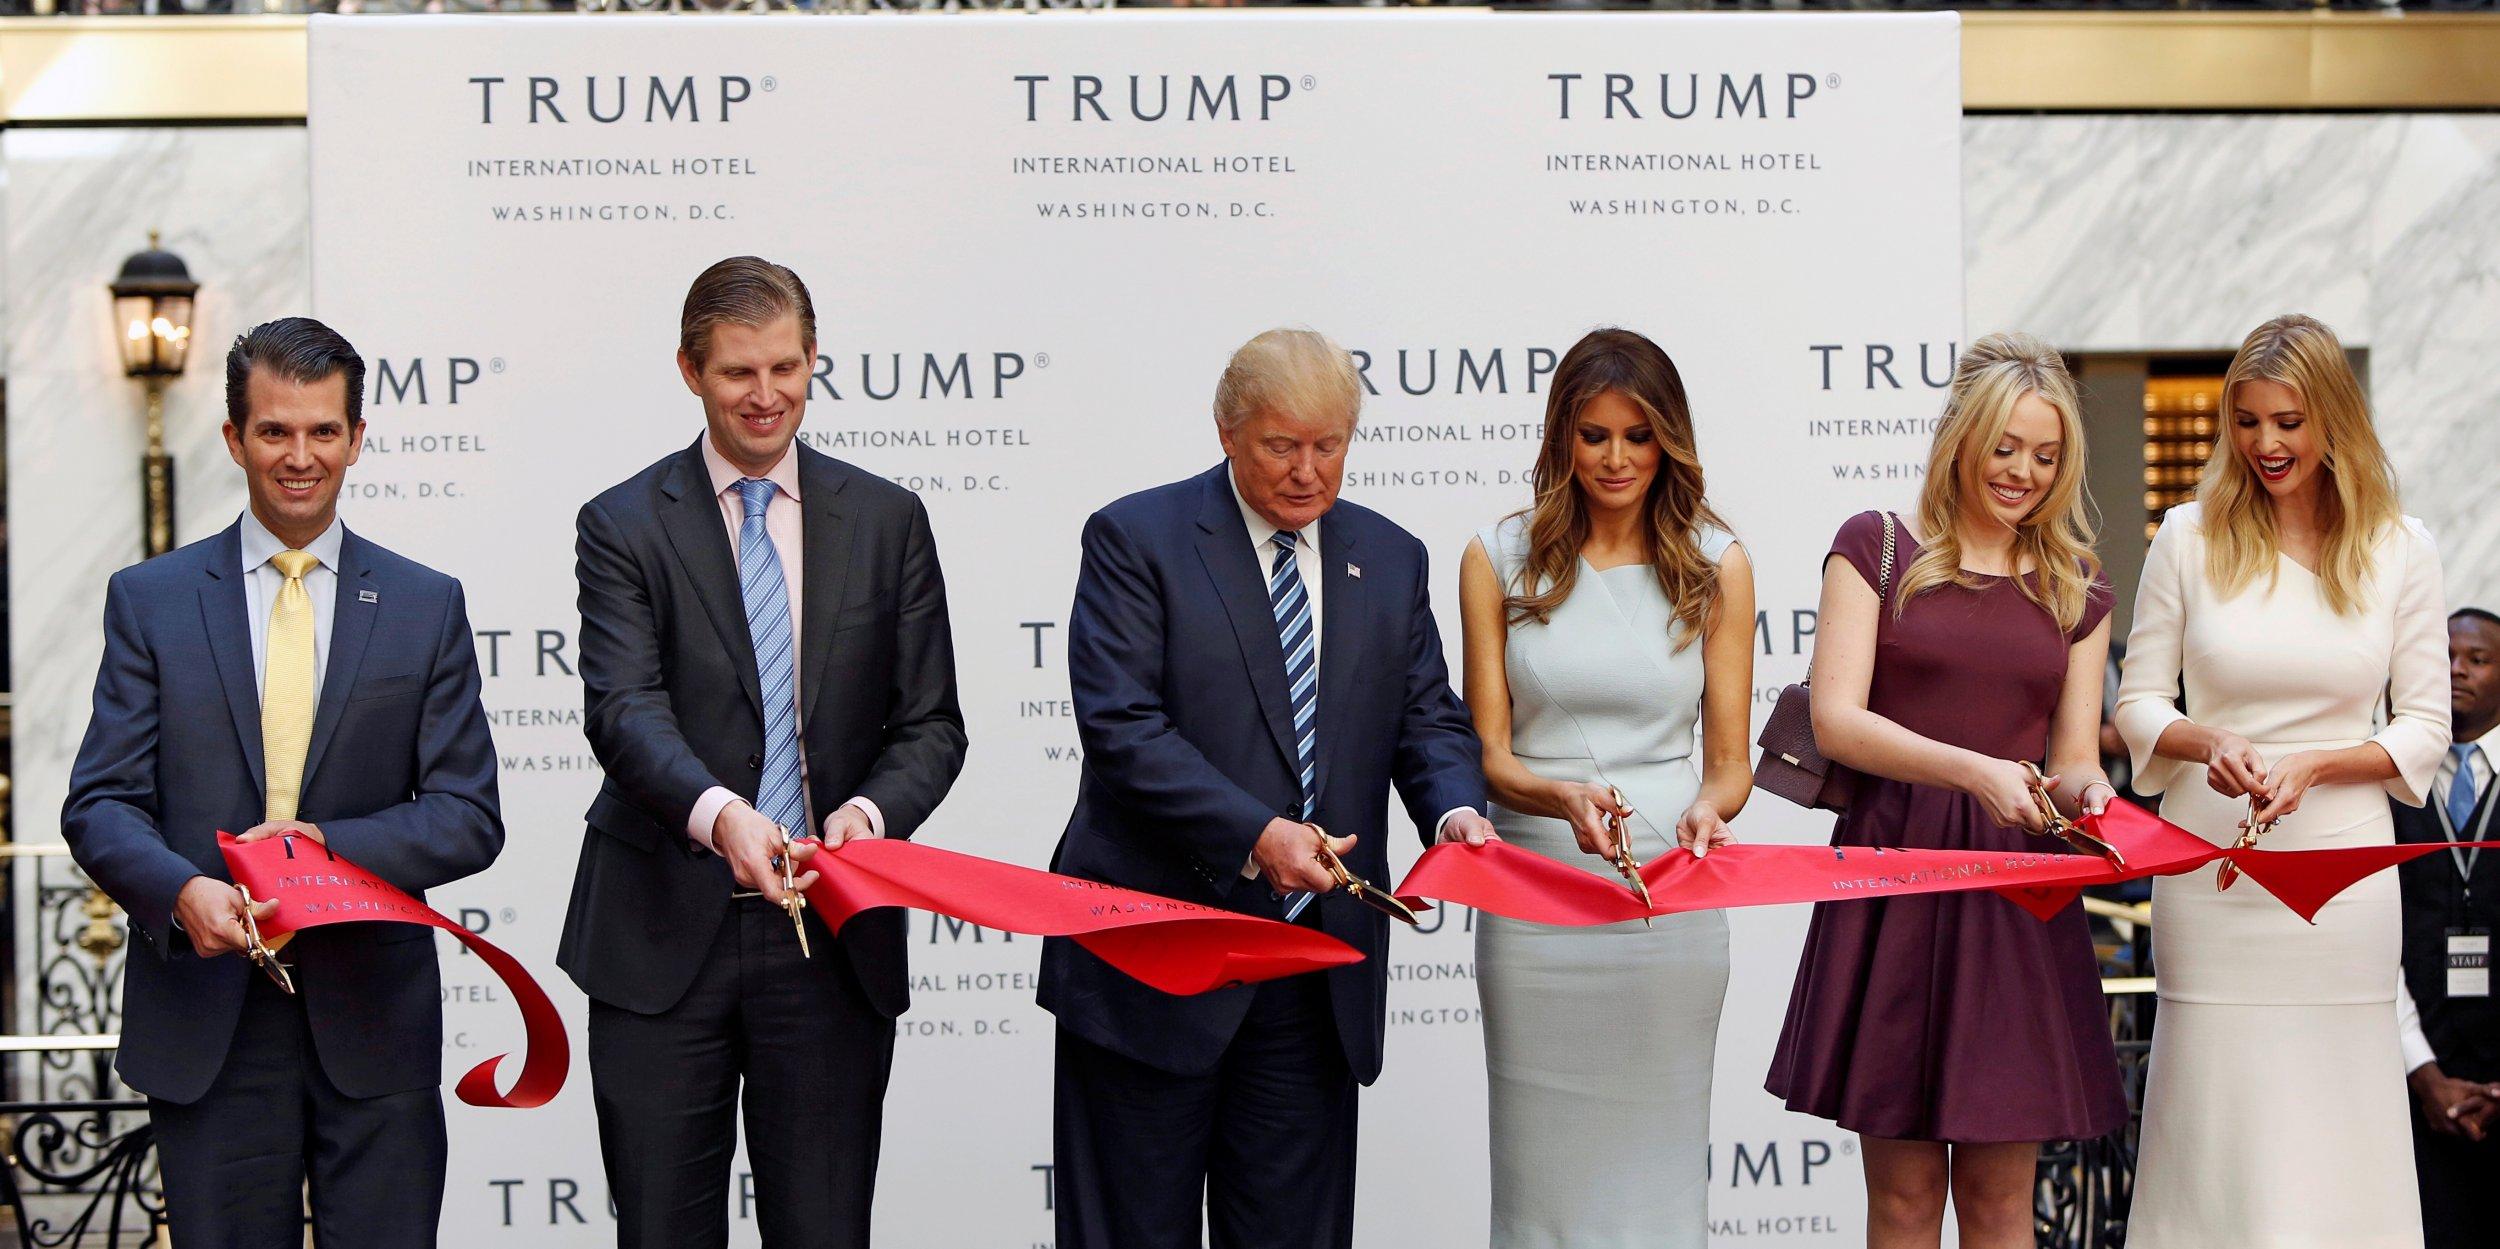 donald trump promotes his washington dc hotel and his